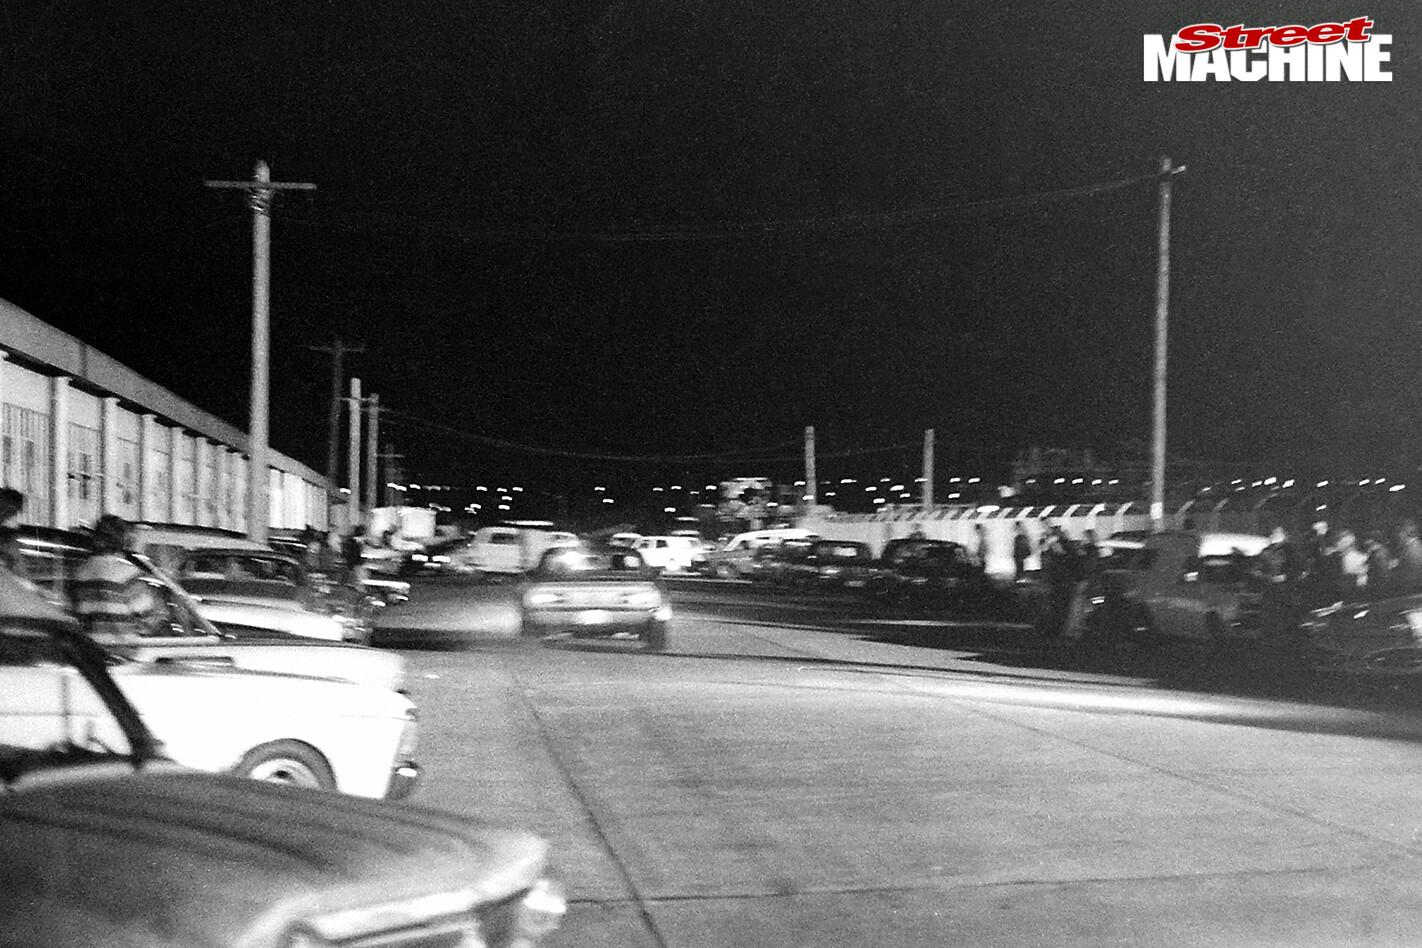 Street -racing